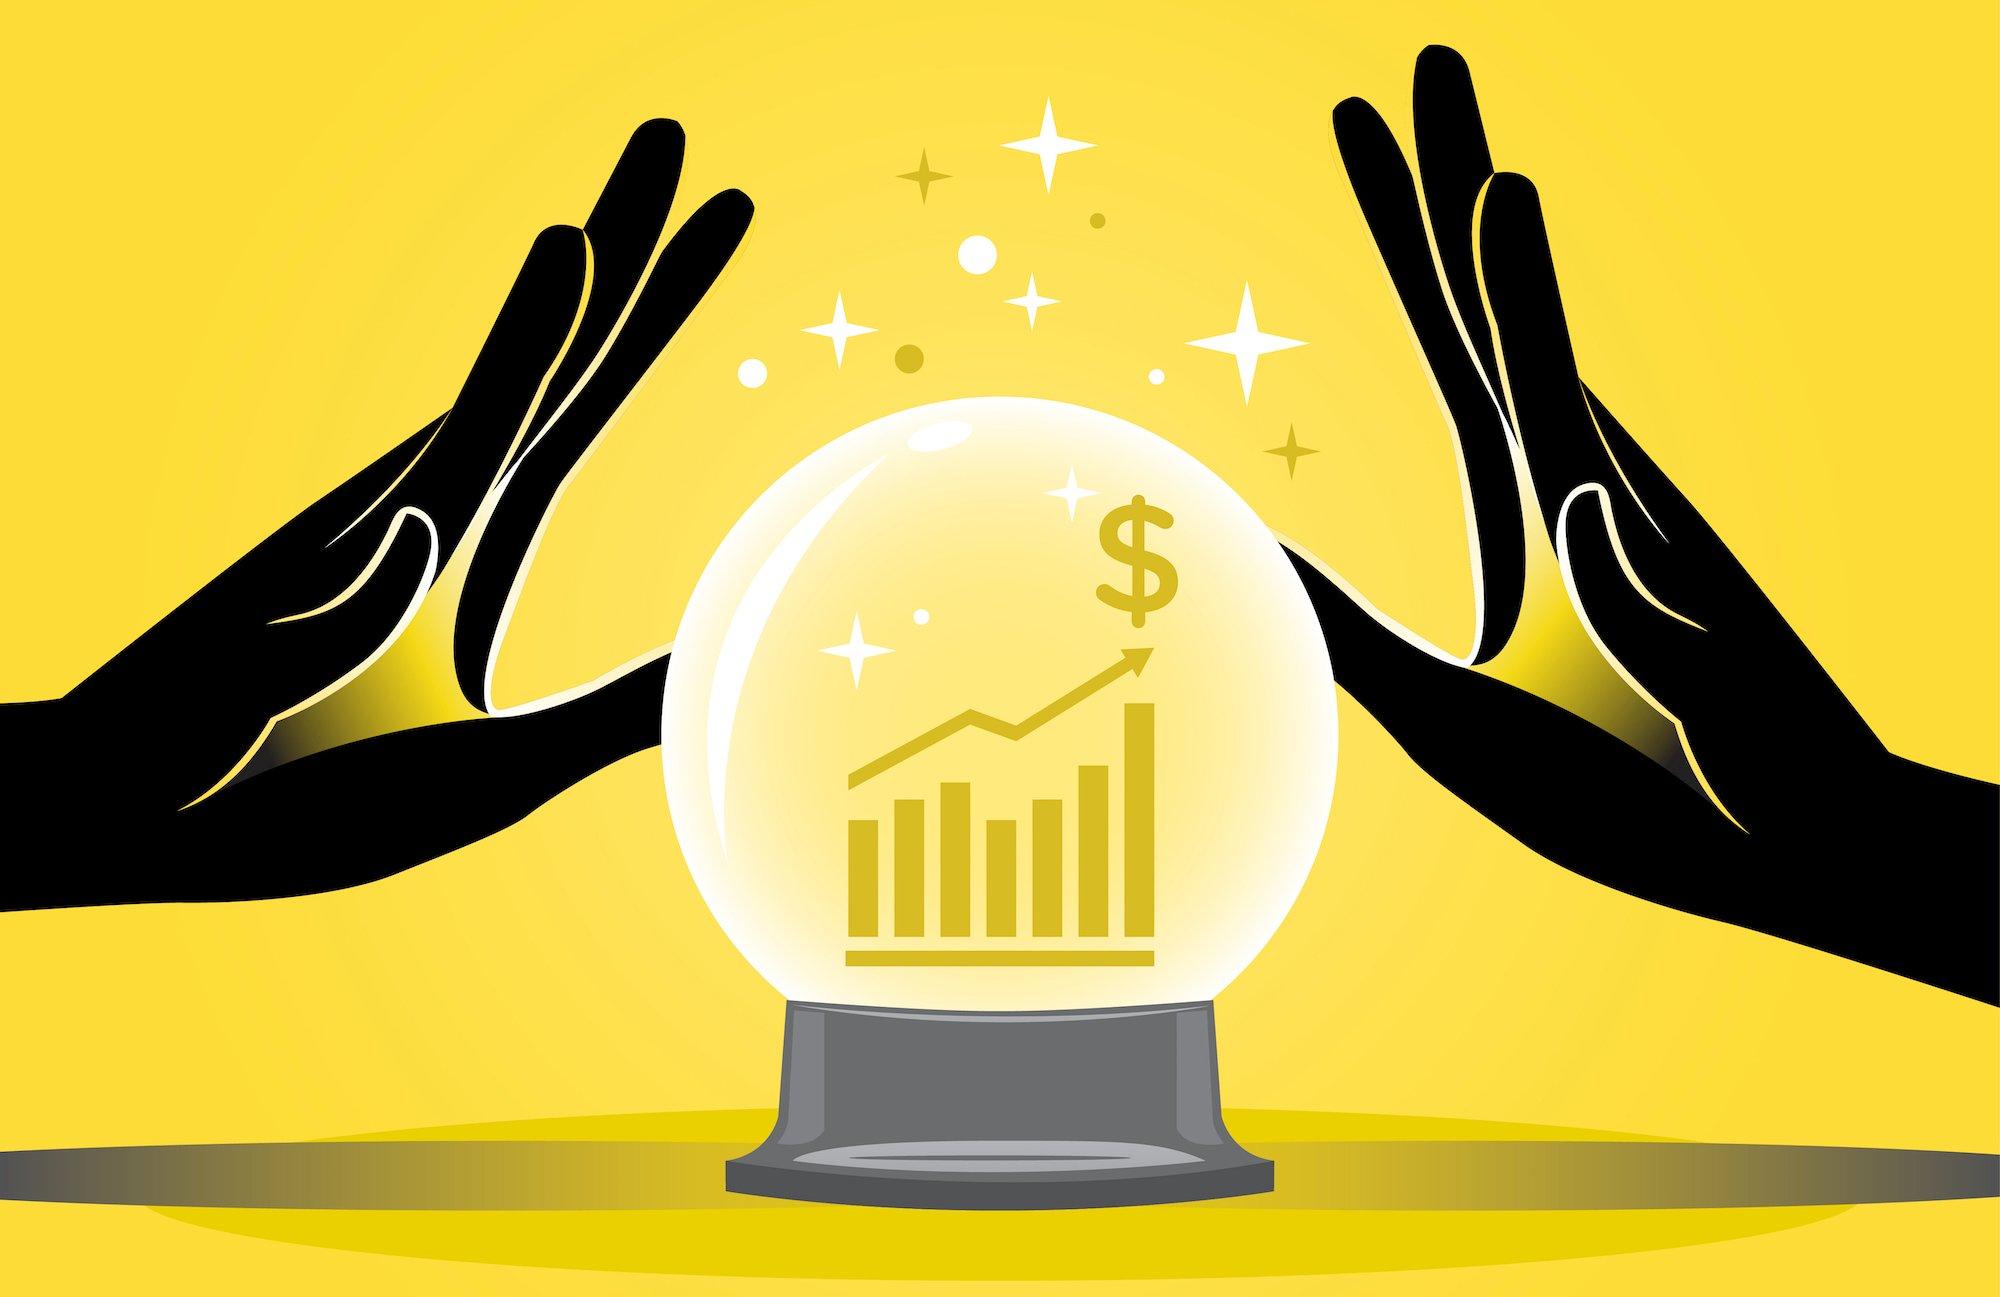 asx-gem-G8-education-profit-up-outlook-growth